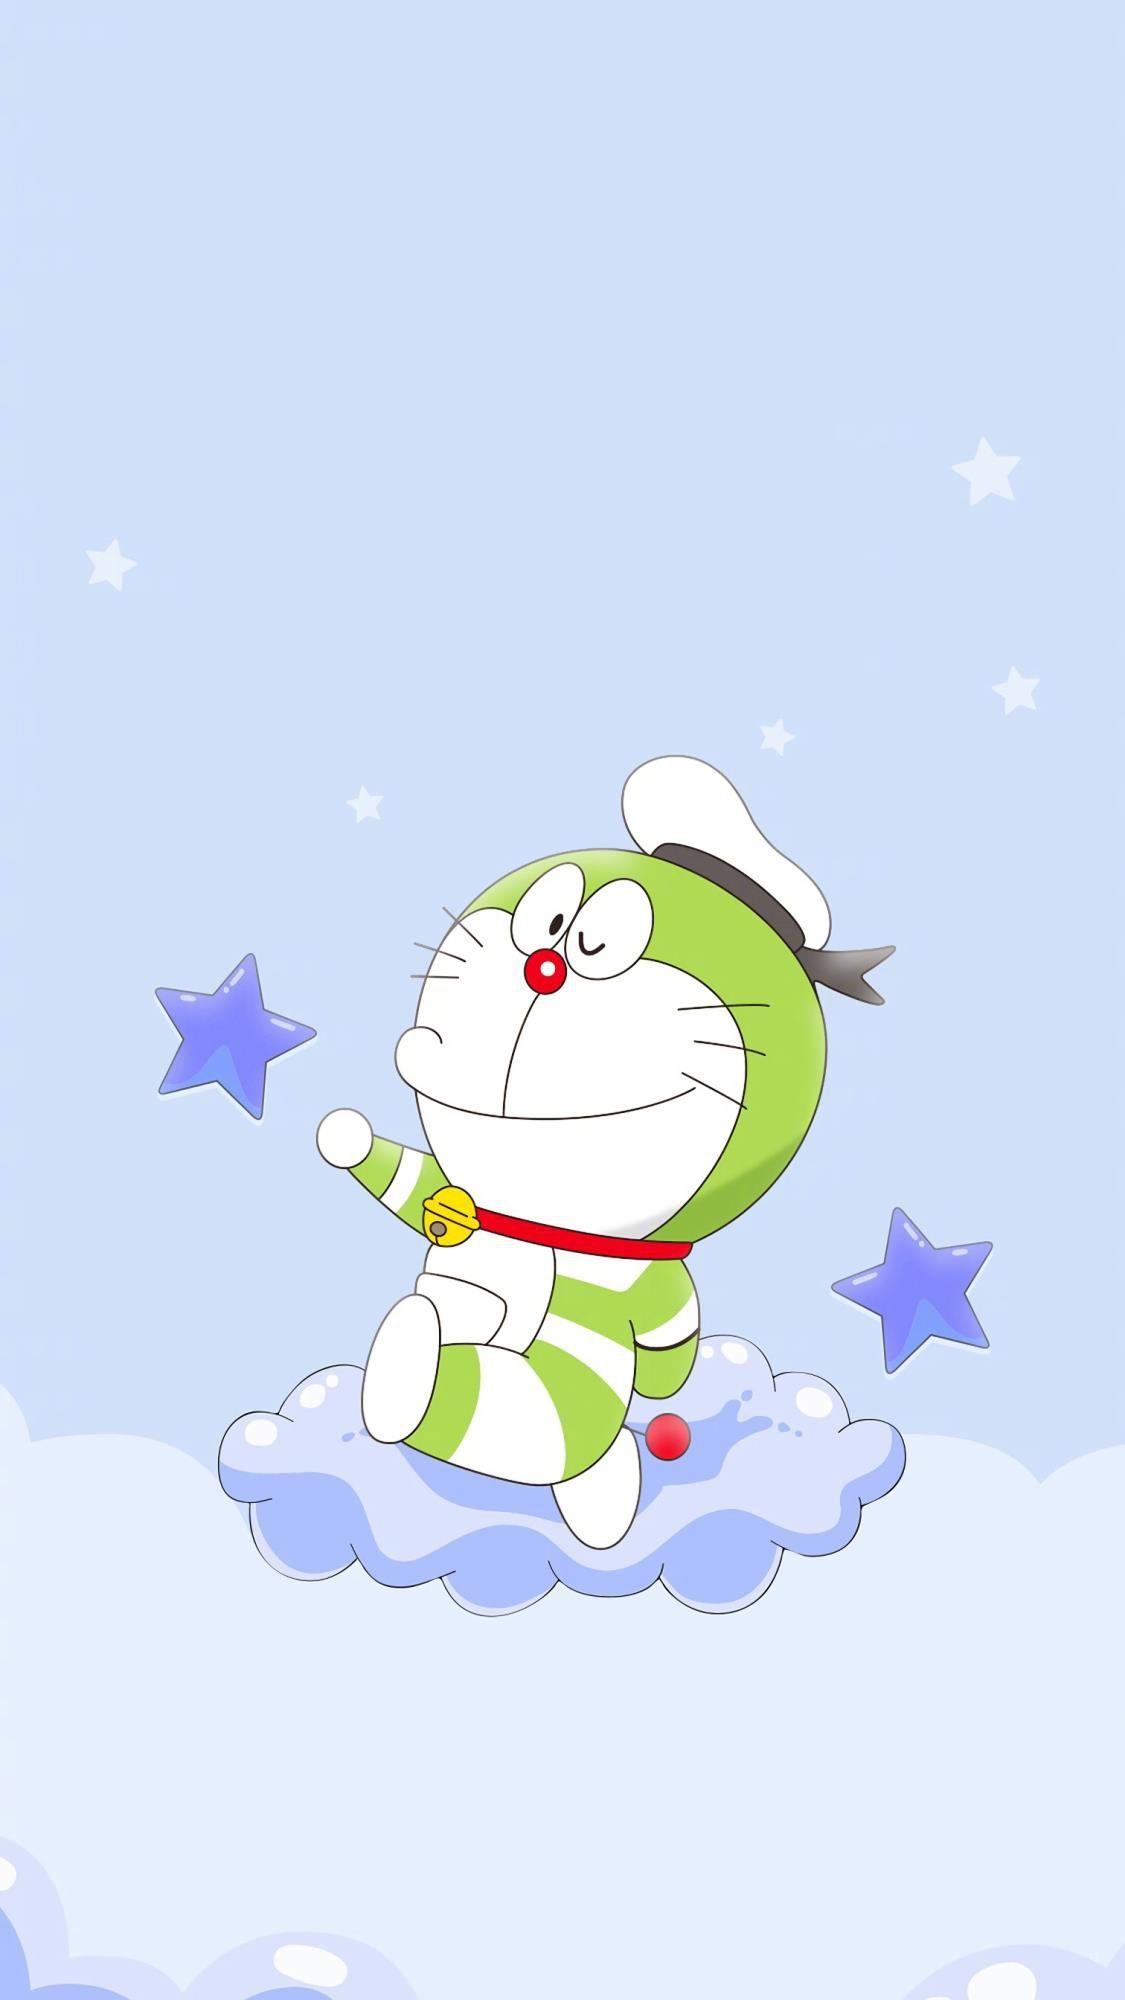 Doraemon Sits On The Cloud The Stars Surround It